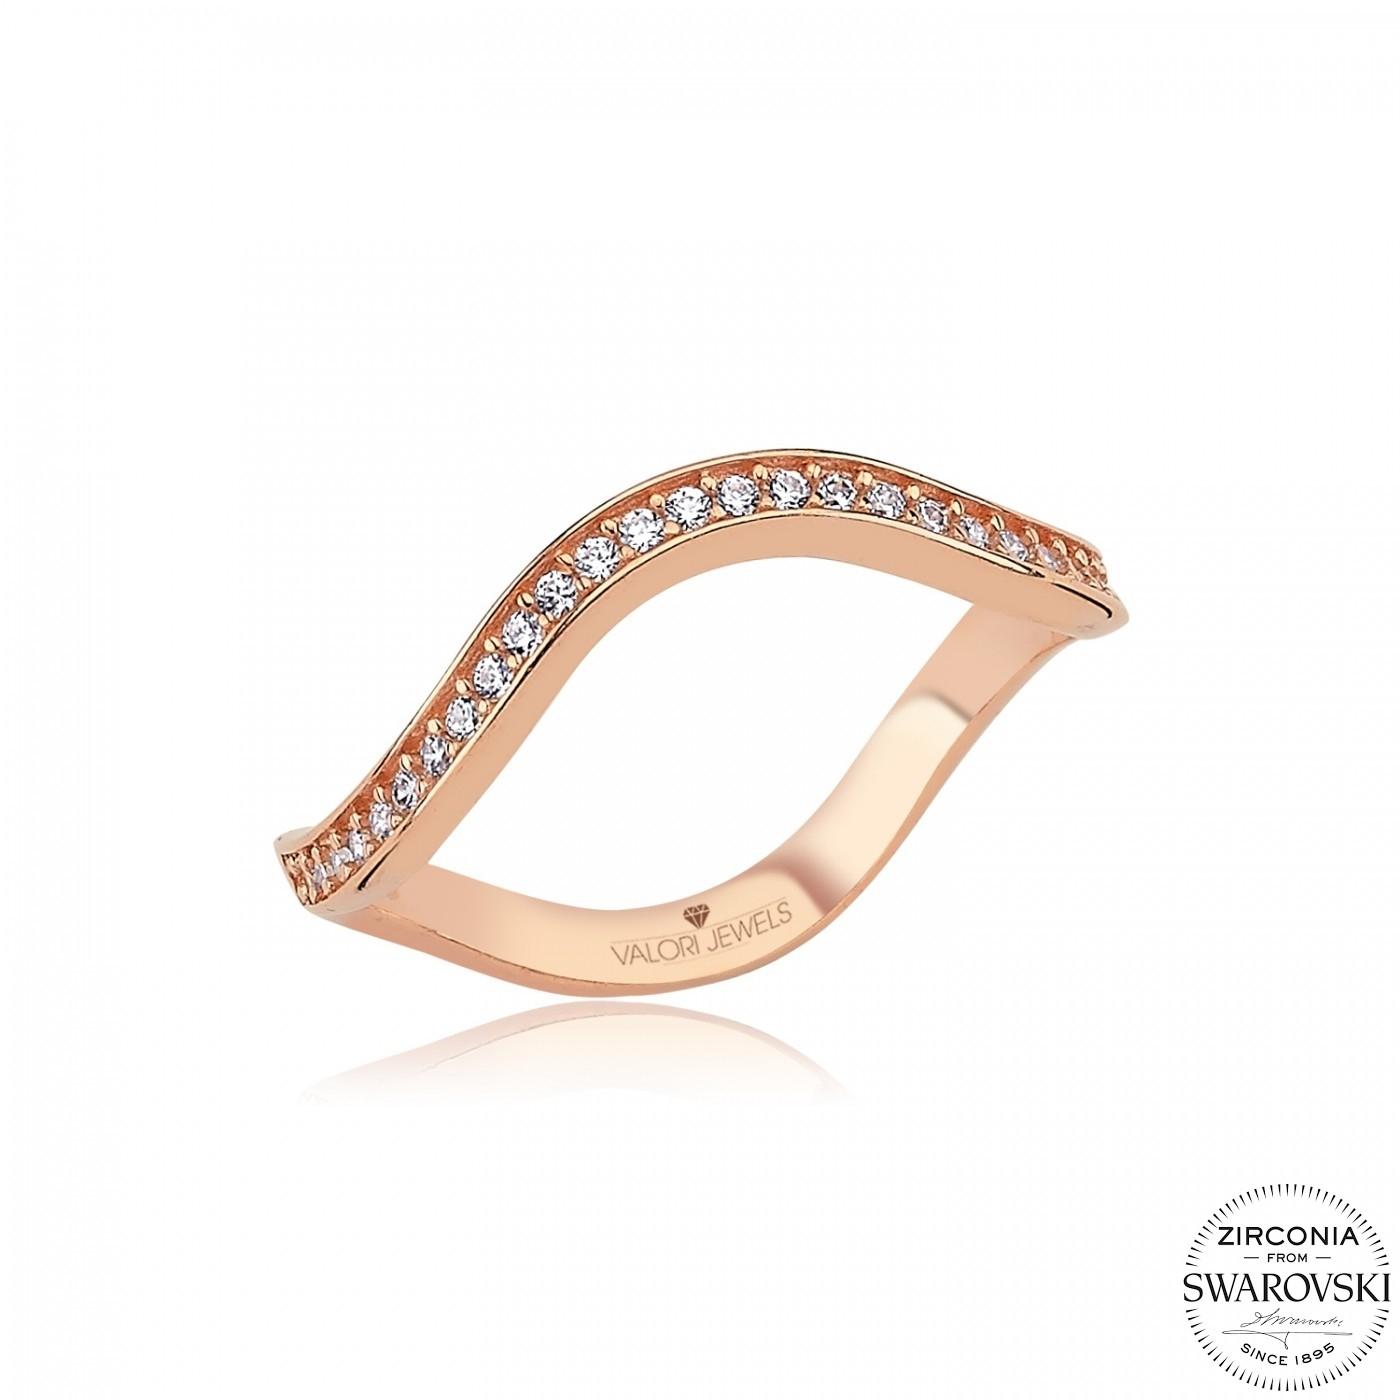 Tülay Fine Jewelry Beaded Wish Ring – Gifts Jewelry Regarding Current Beaded Wishbone Rings (View 19 of 25)